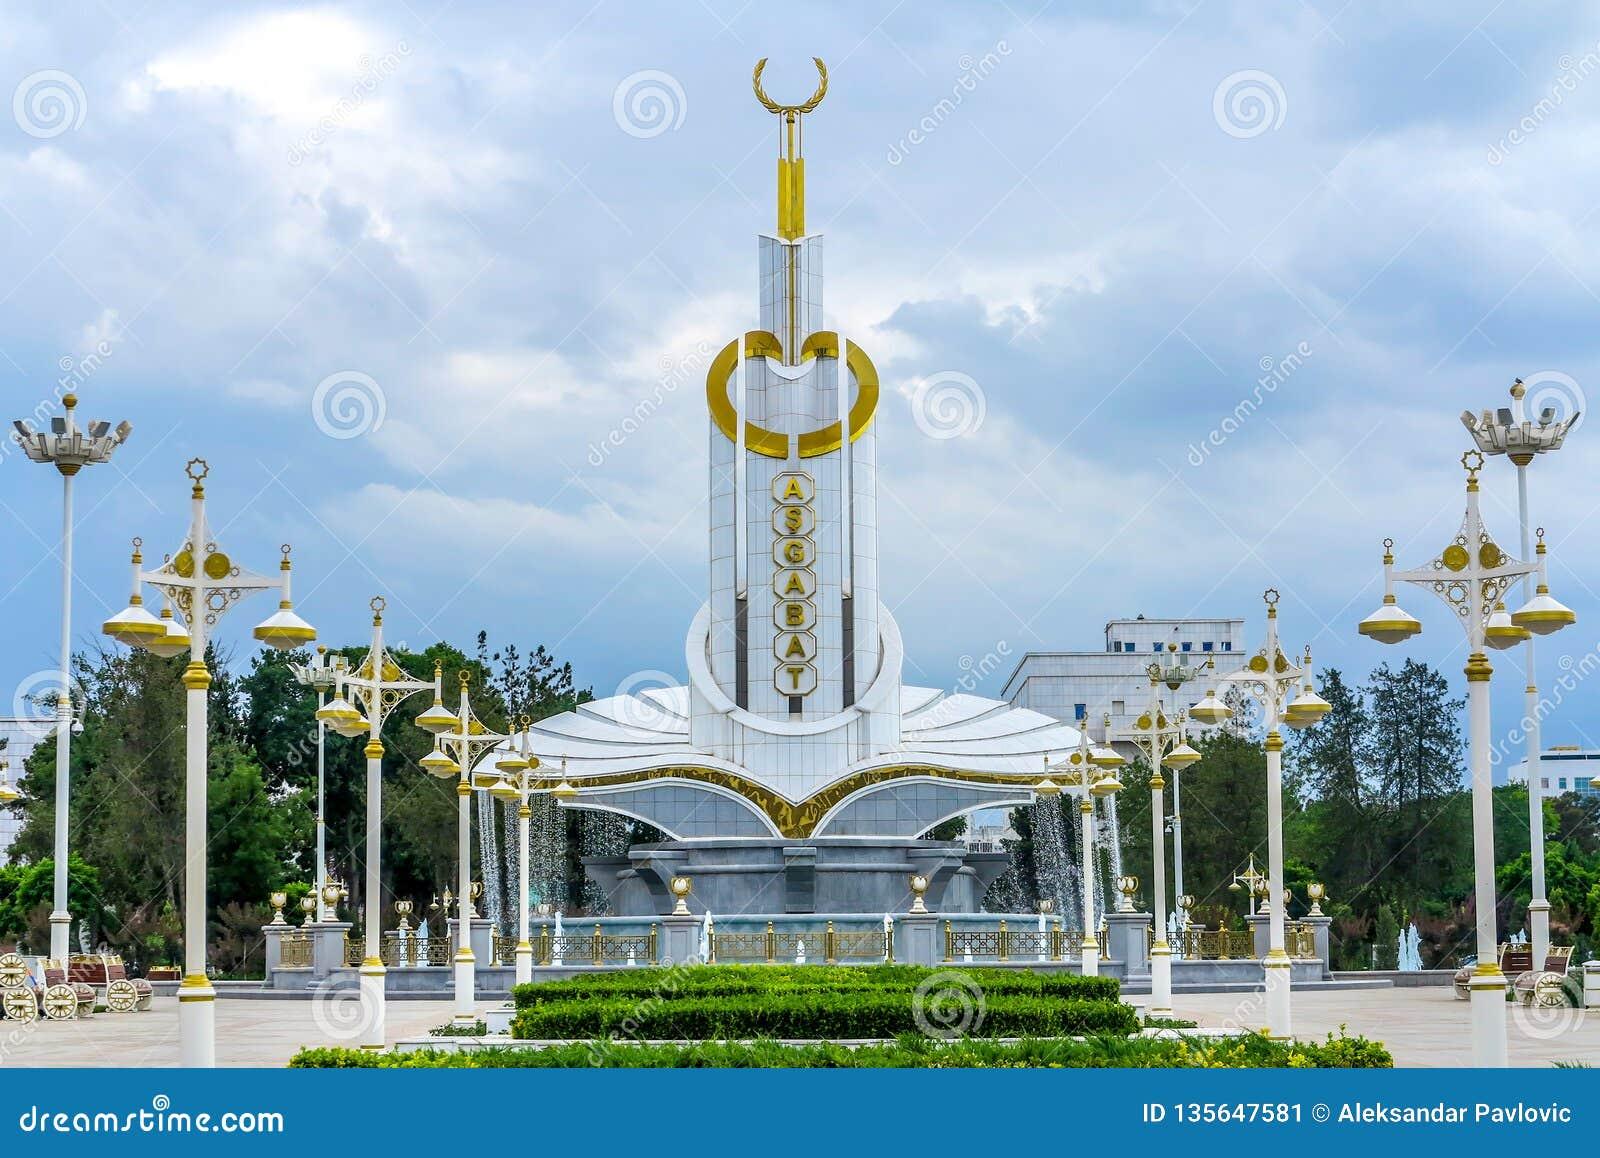 Ashgabat Monument with Wreath